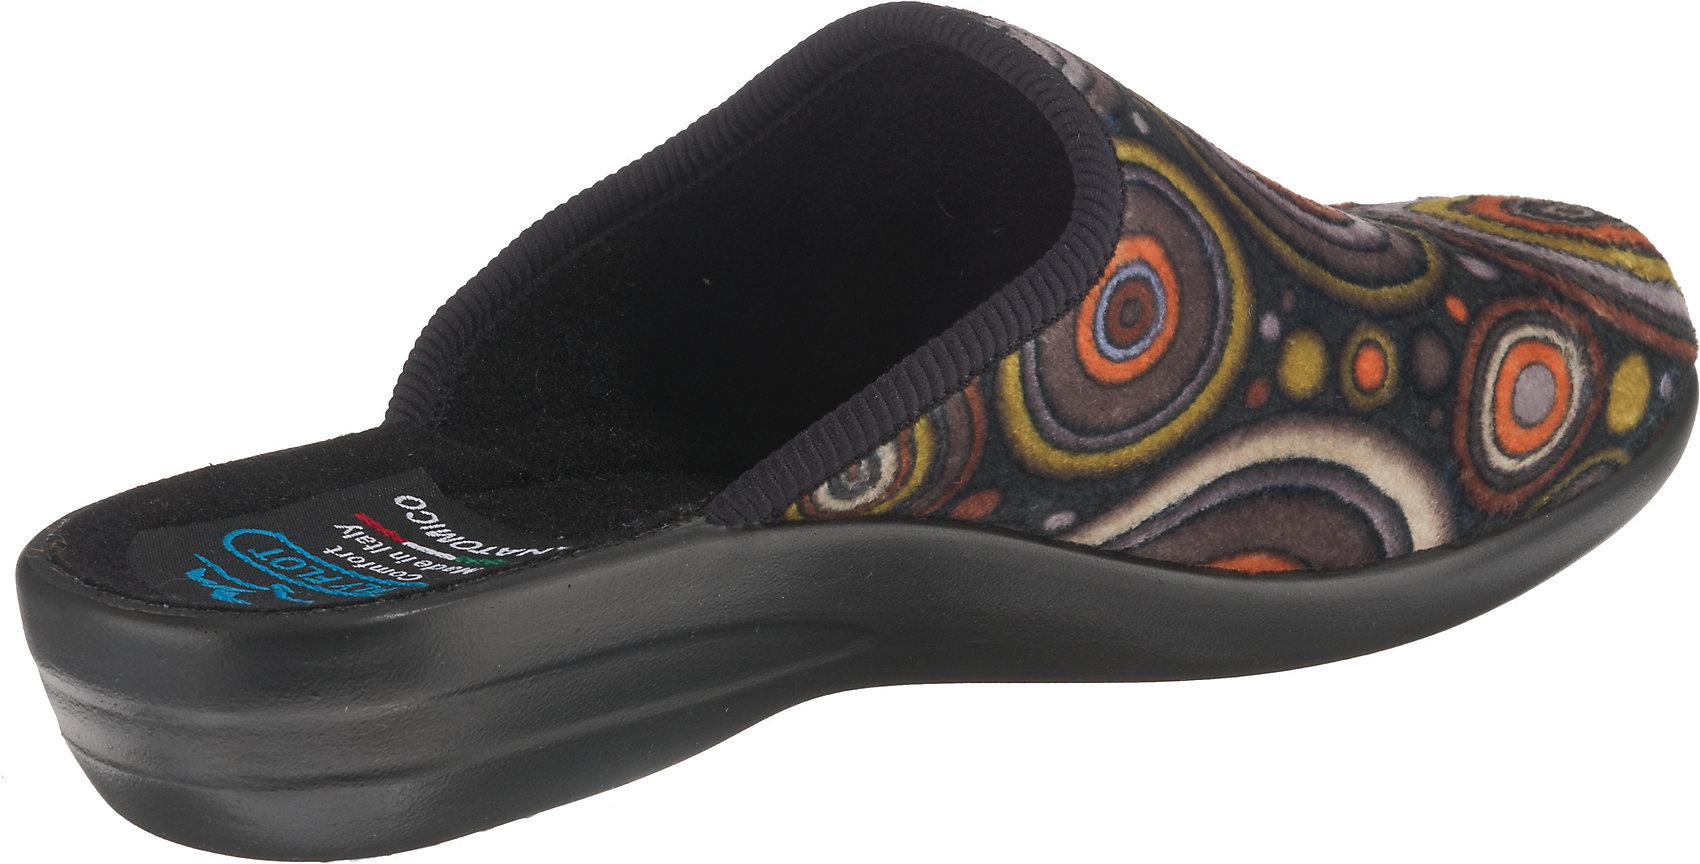 Neu FLY FLOT Pantoffeln 11994601 für Damen mehrfarbig